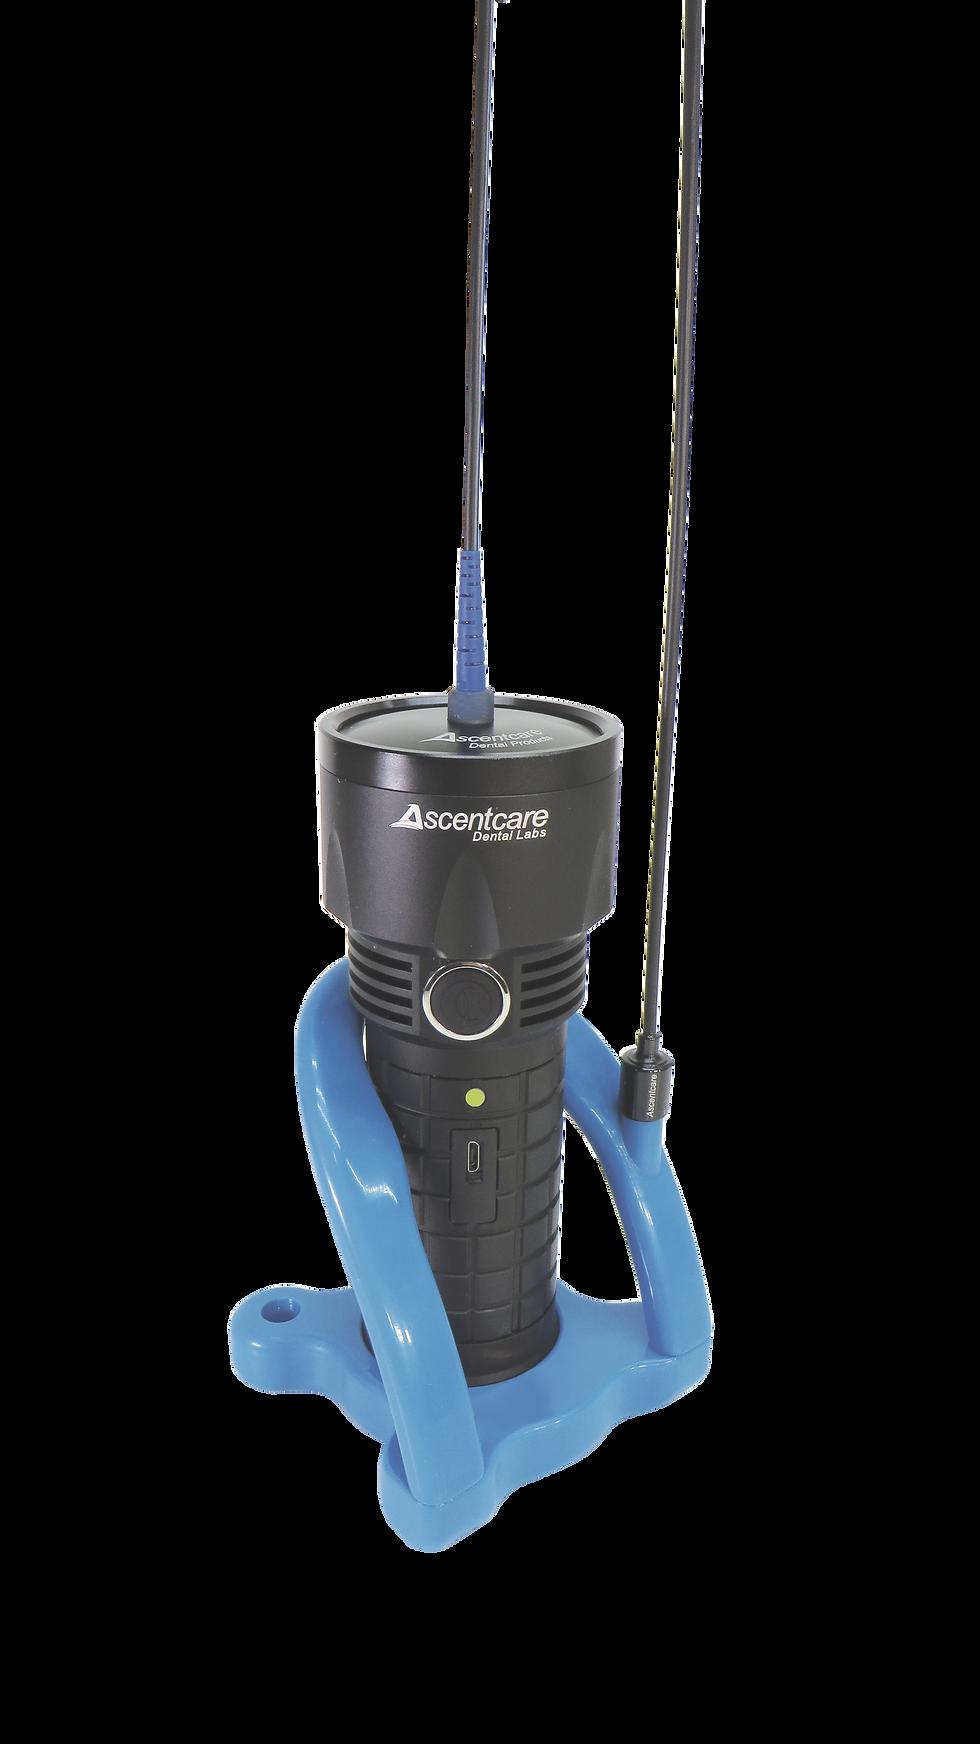 The HyperLUX Light Engine fiber optic dental instrument illuminator